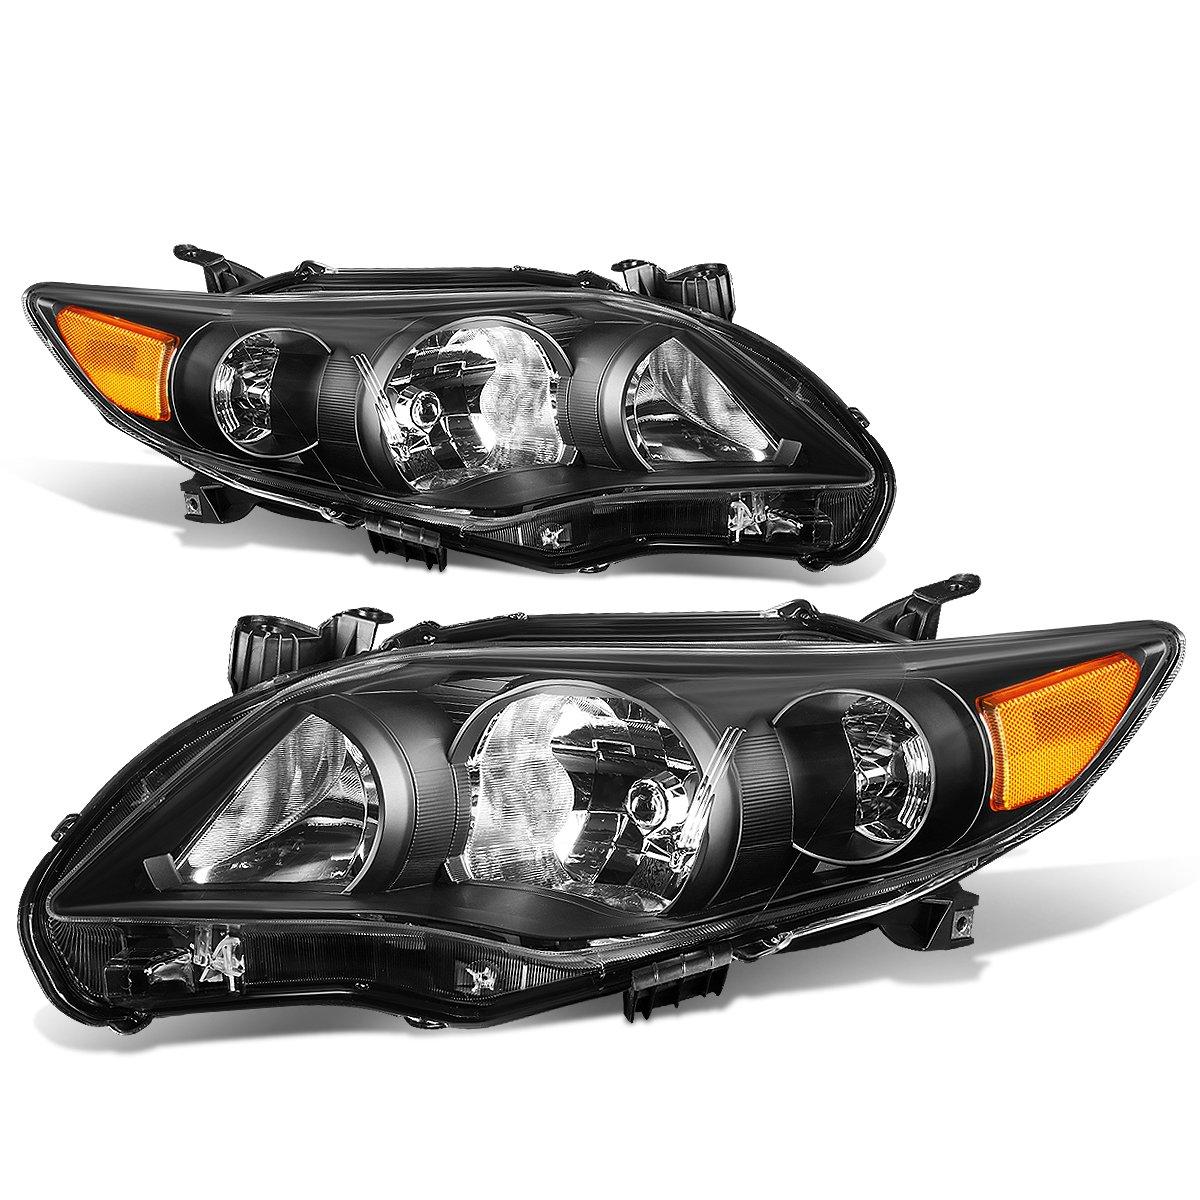 Replacement for Corolla Sedan Pair of Black Housing Amber Corner Headlight Kit